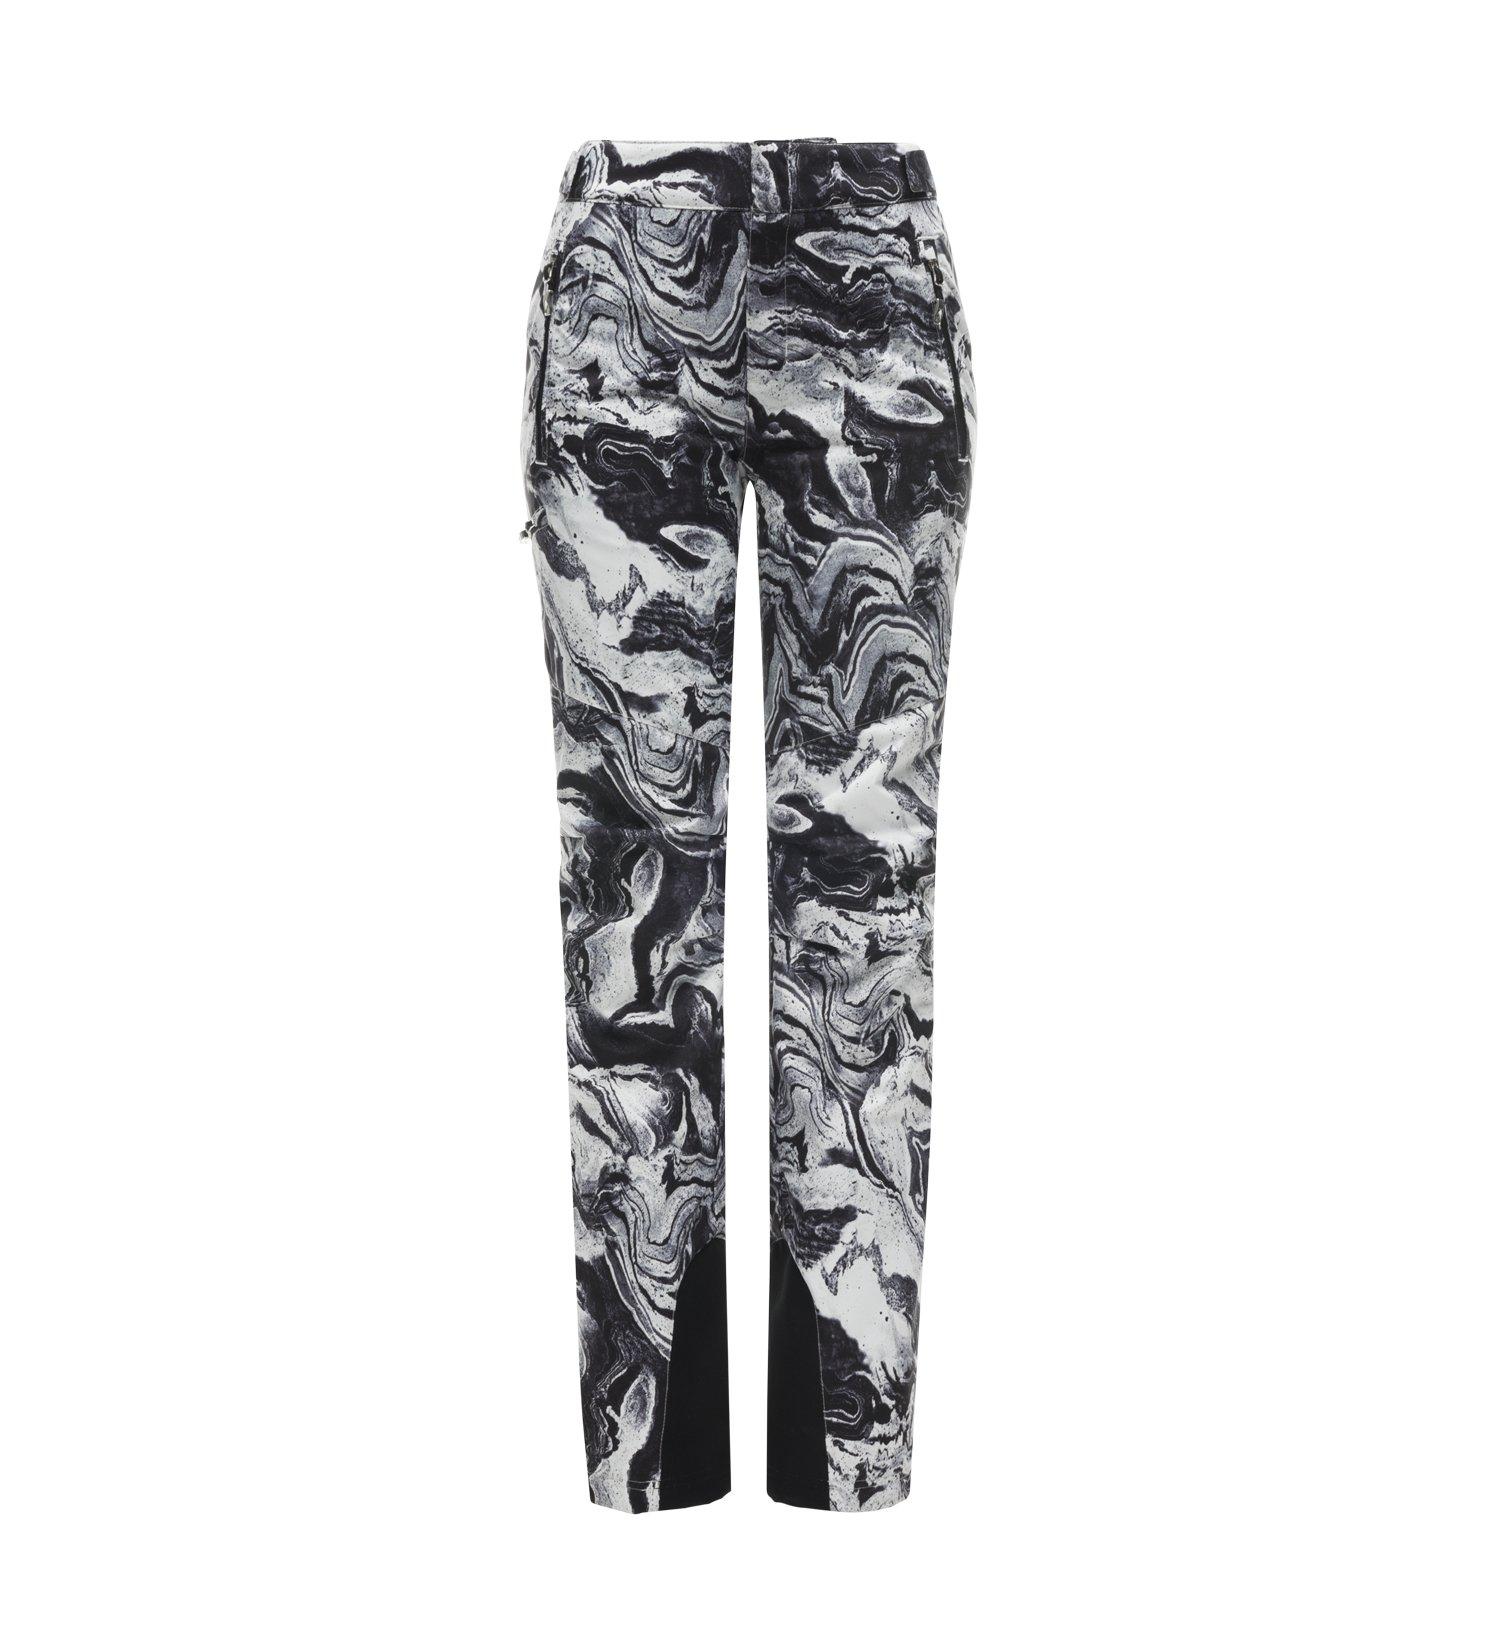 Spyder Womens Winner Tailored Pant